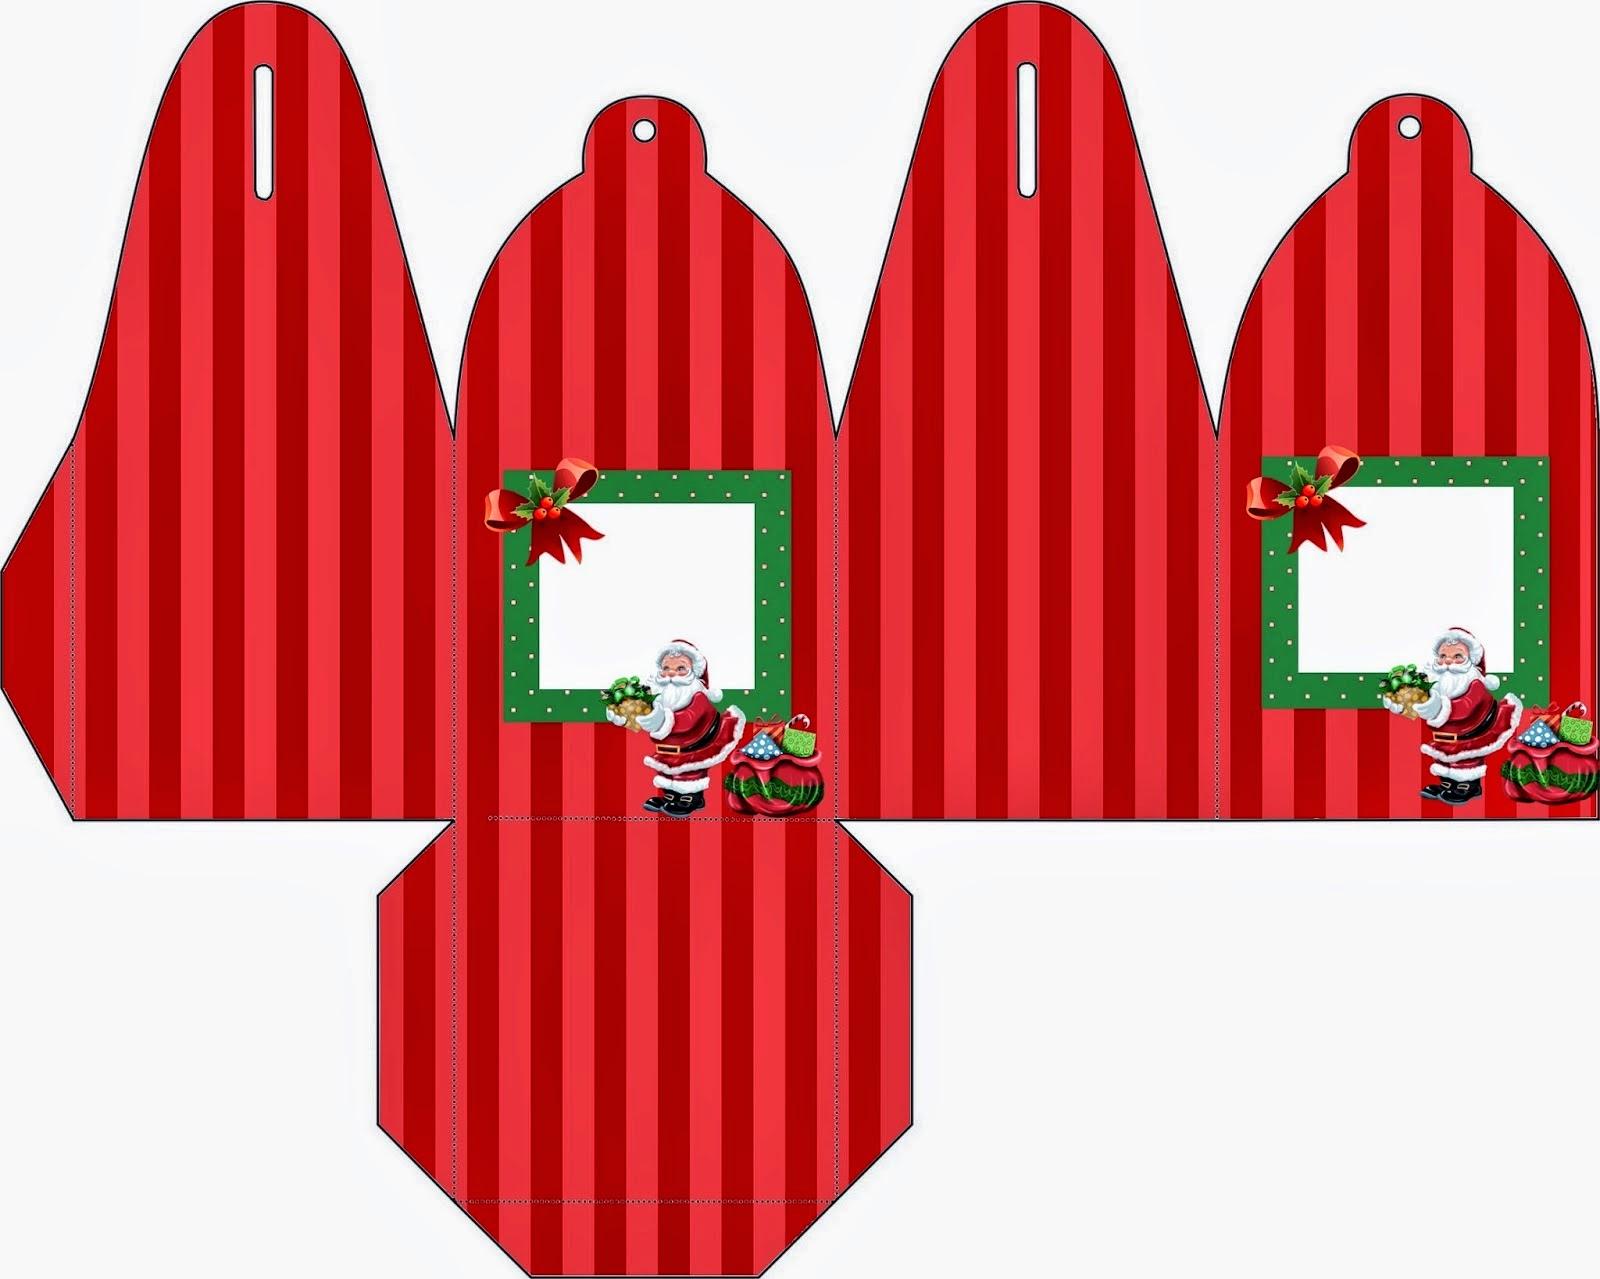 Caja para cupcakes, chocoltes o golosinas de Santa en Navidad.